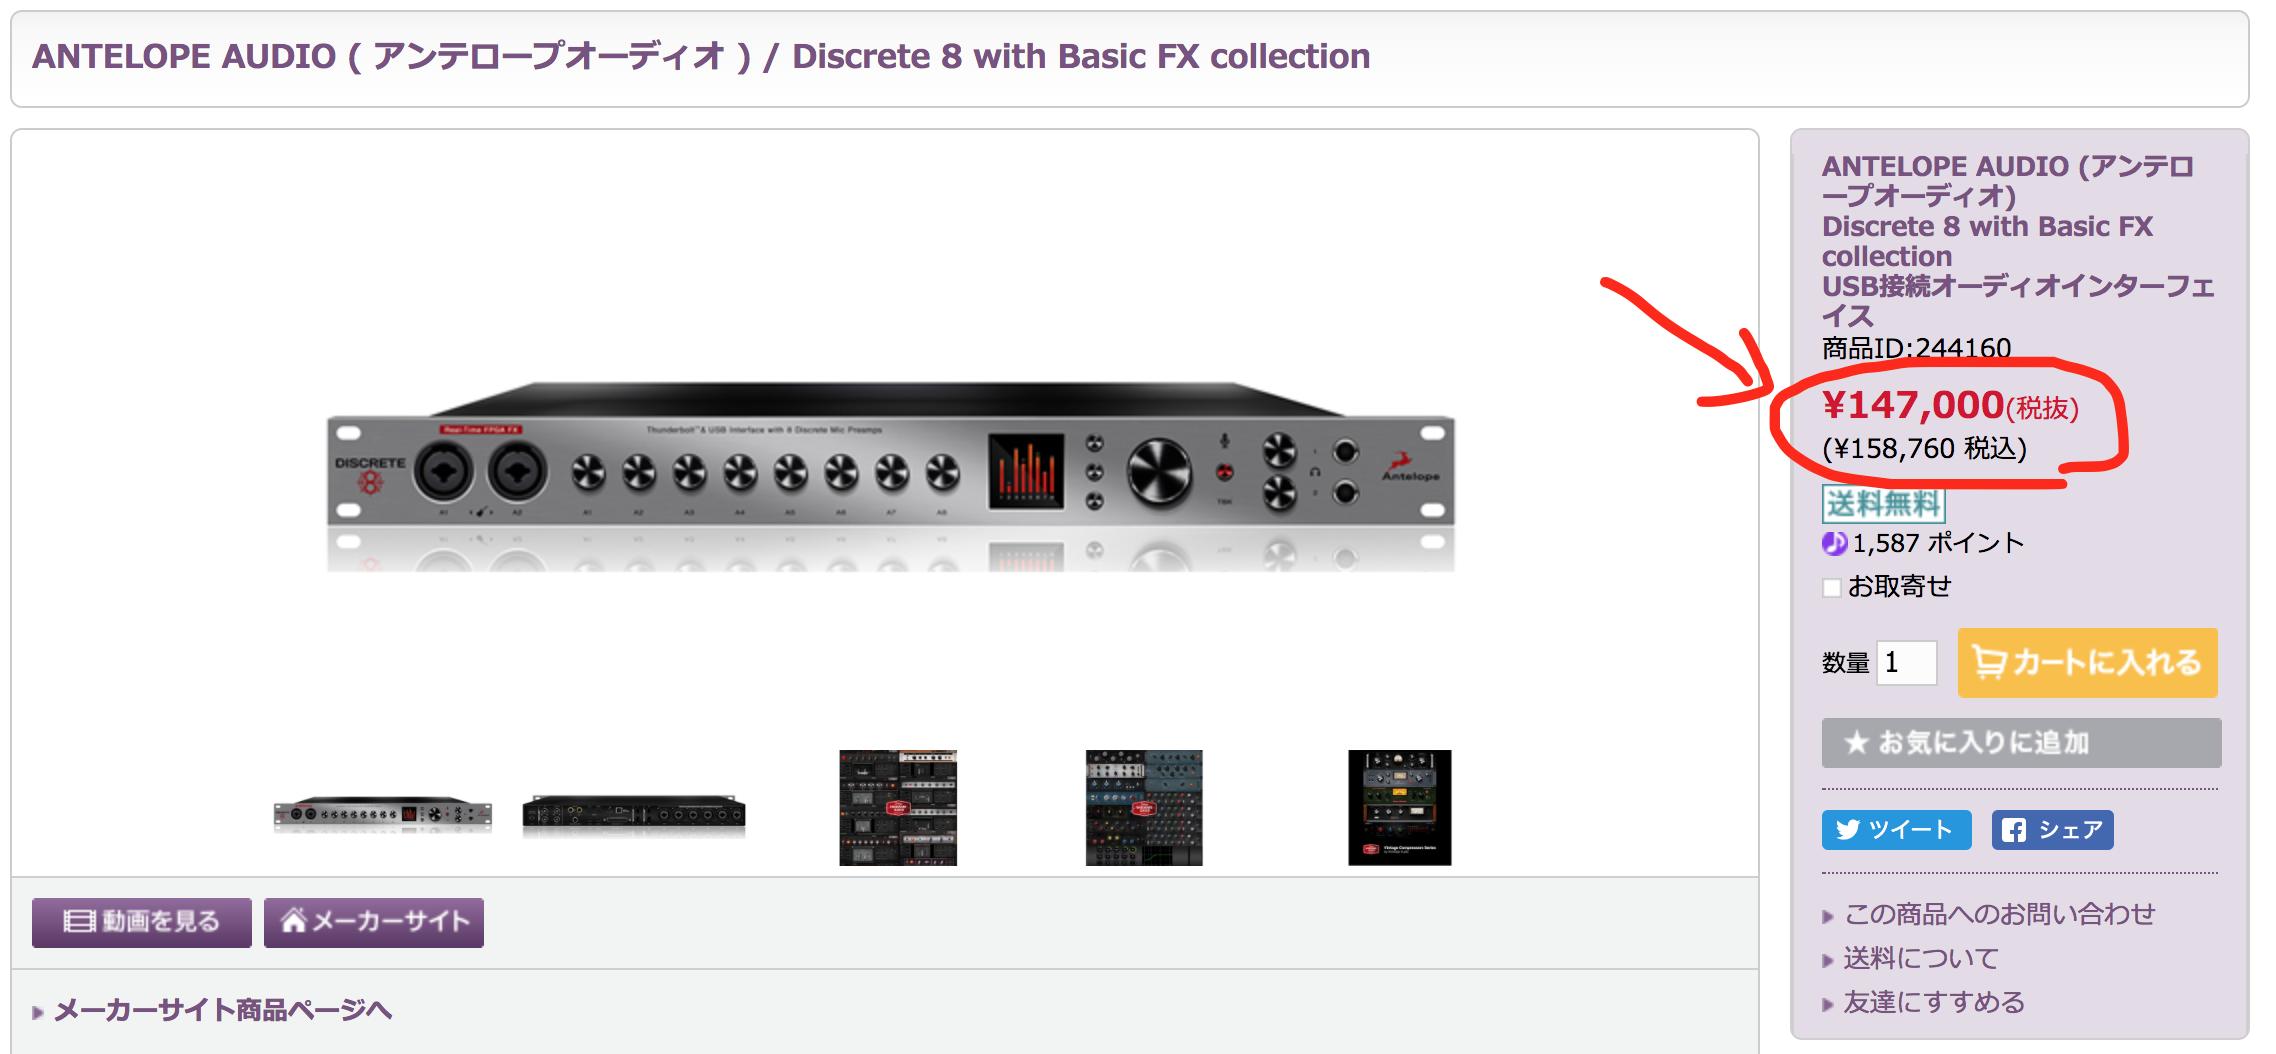 ANTELOPE AUDIO ( アンテロープオーディオ : : Discrete 8 with Basic FX collection|画像